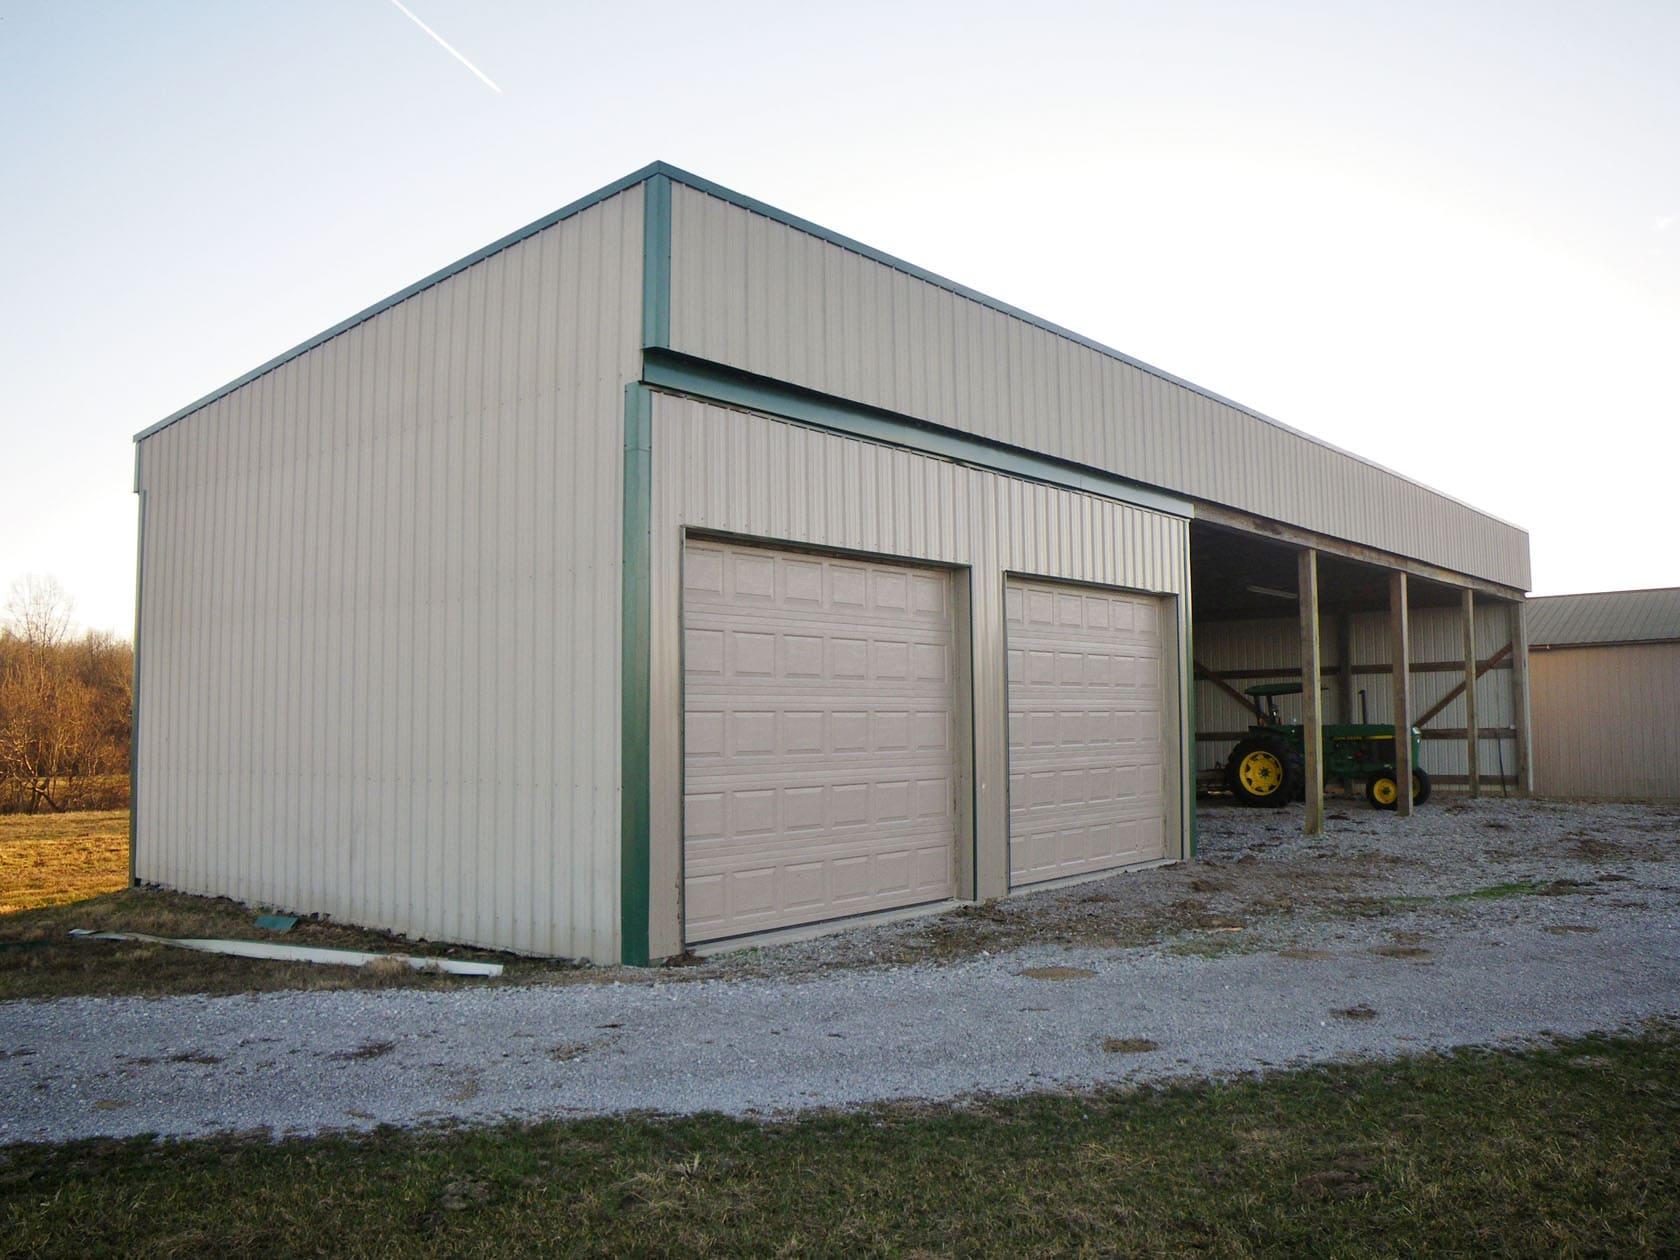 Roaring Paunch Cattle Farm farm operation buildings 1